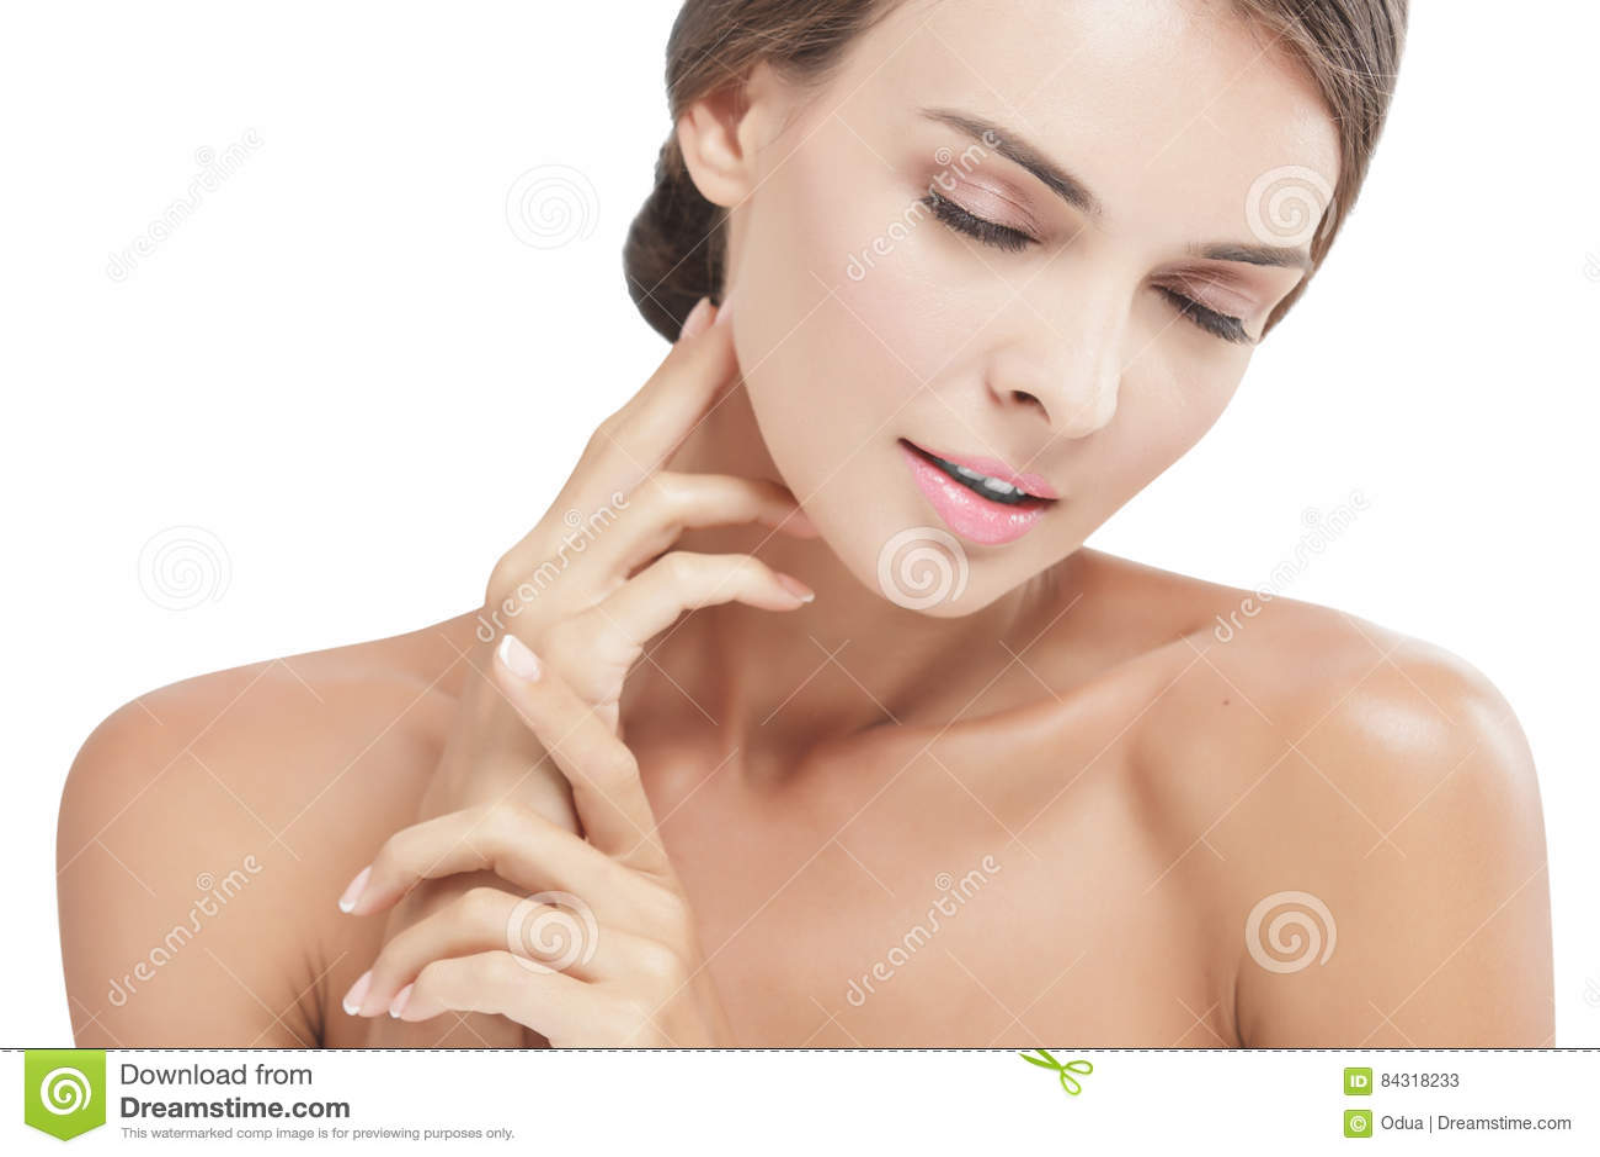 Nude girls in showering room gifs